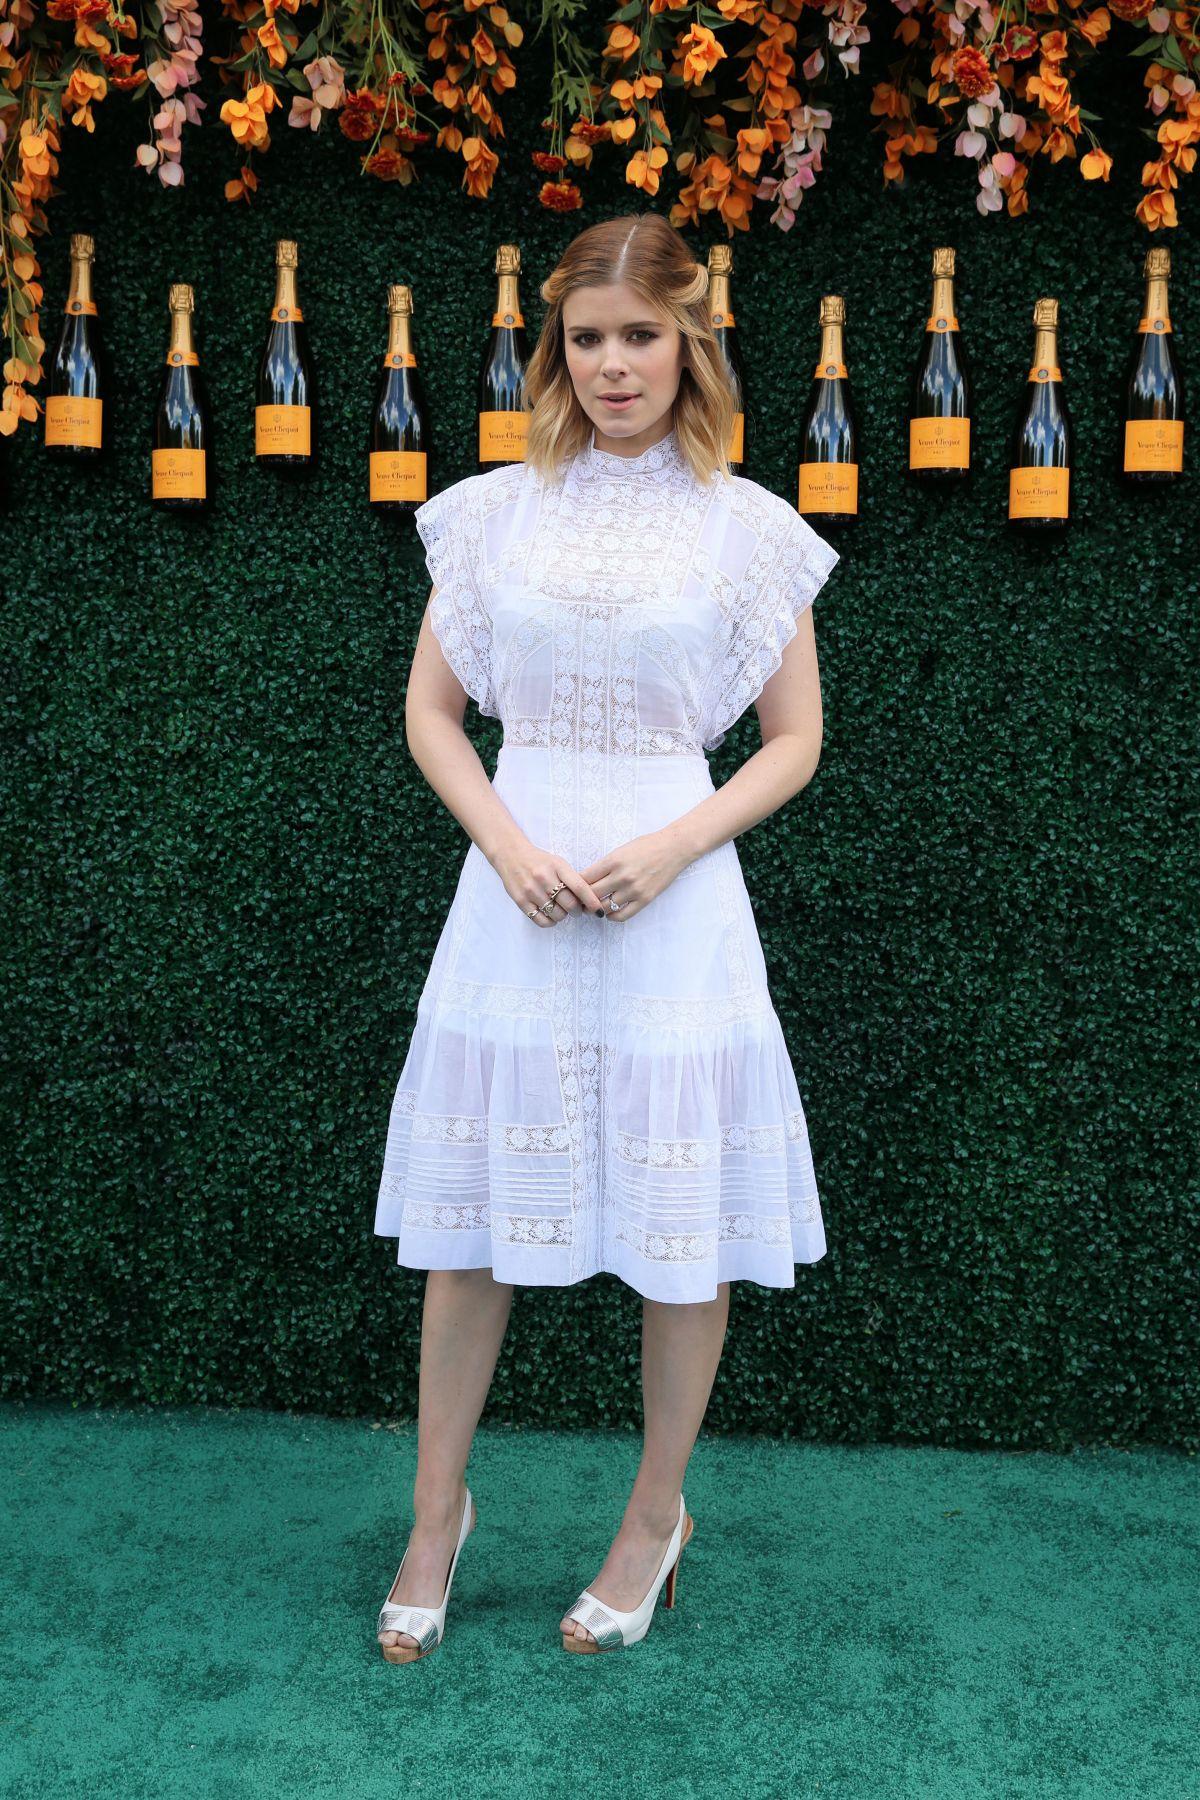 Kate Mara @ Veuve Cliquot polo classic, Jersey City 03.06.2017 (5).jpg